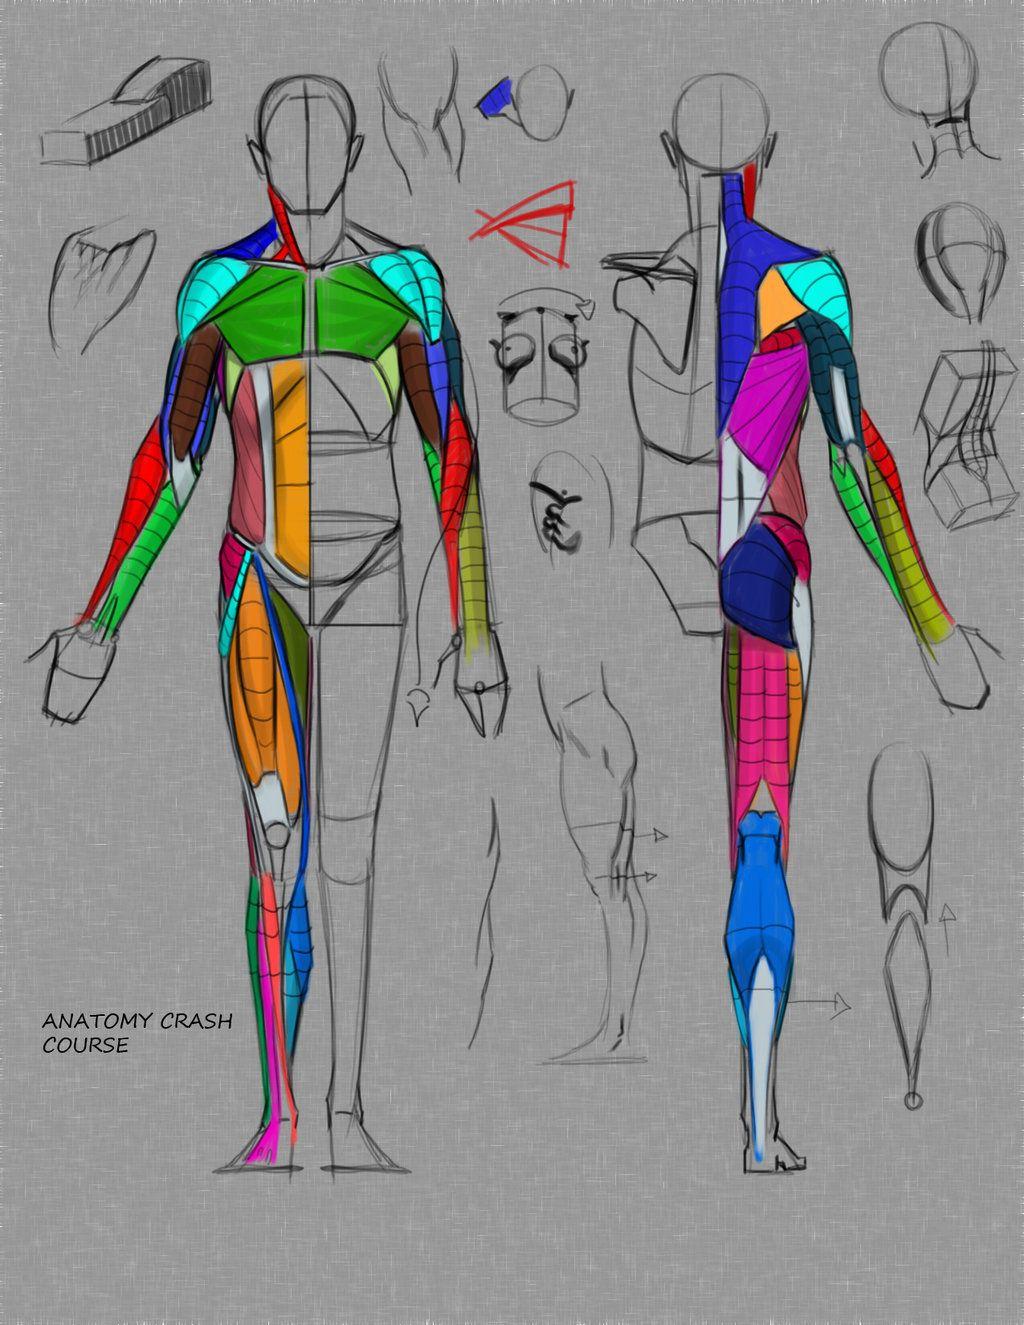 Anatomy Crash Course By Funkymonkey1945iantart On